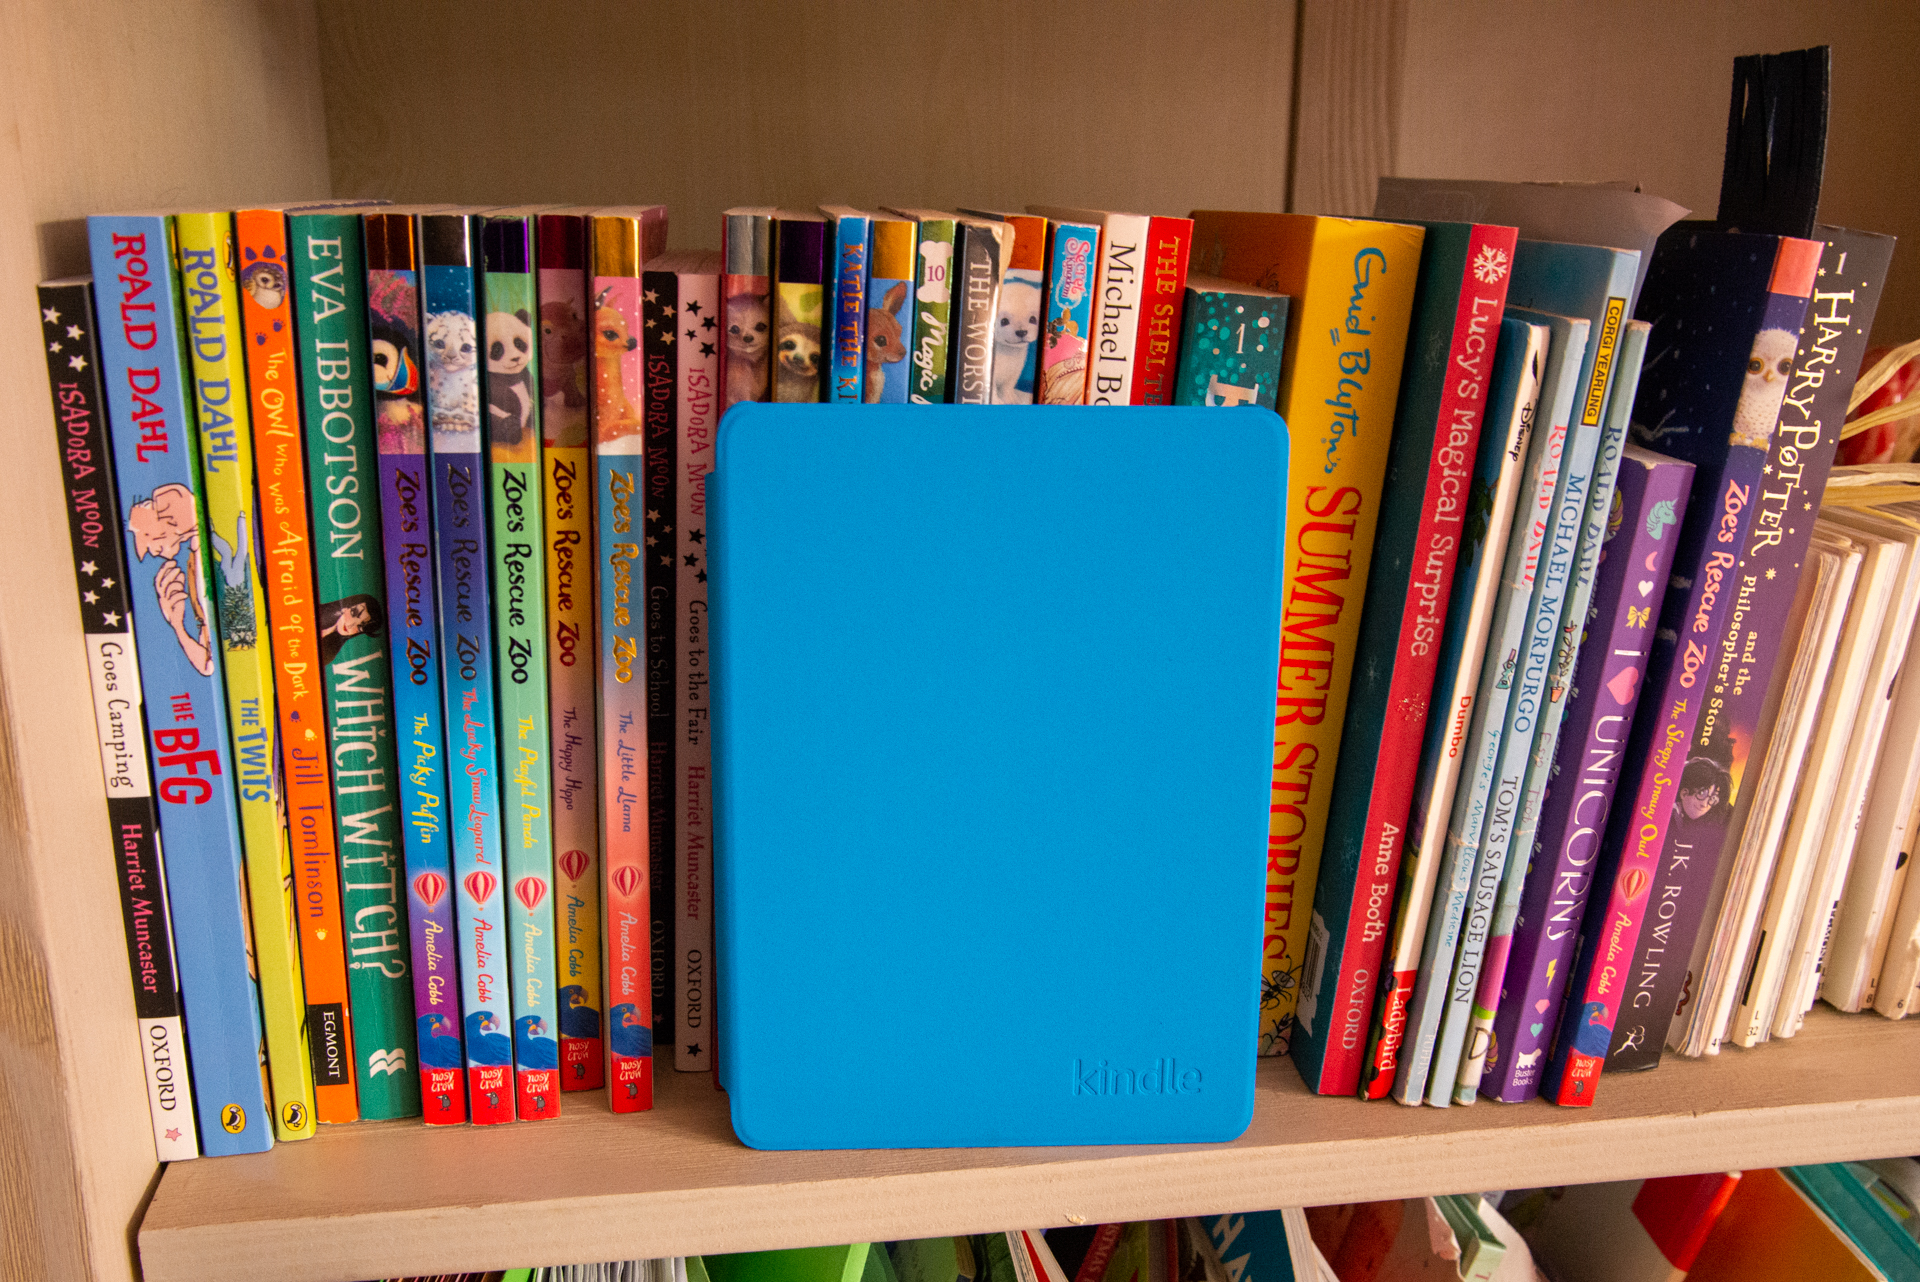 Funda Amazon Kindle Kids Edition